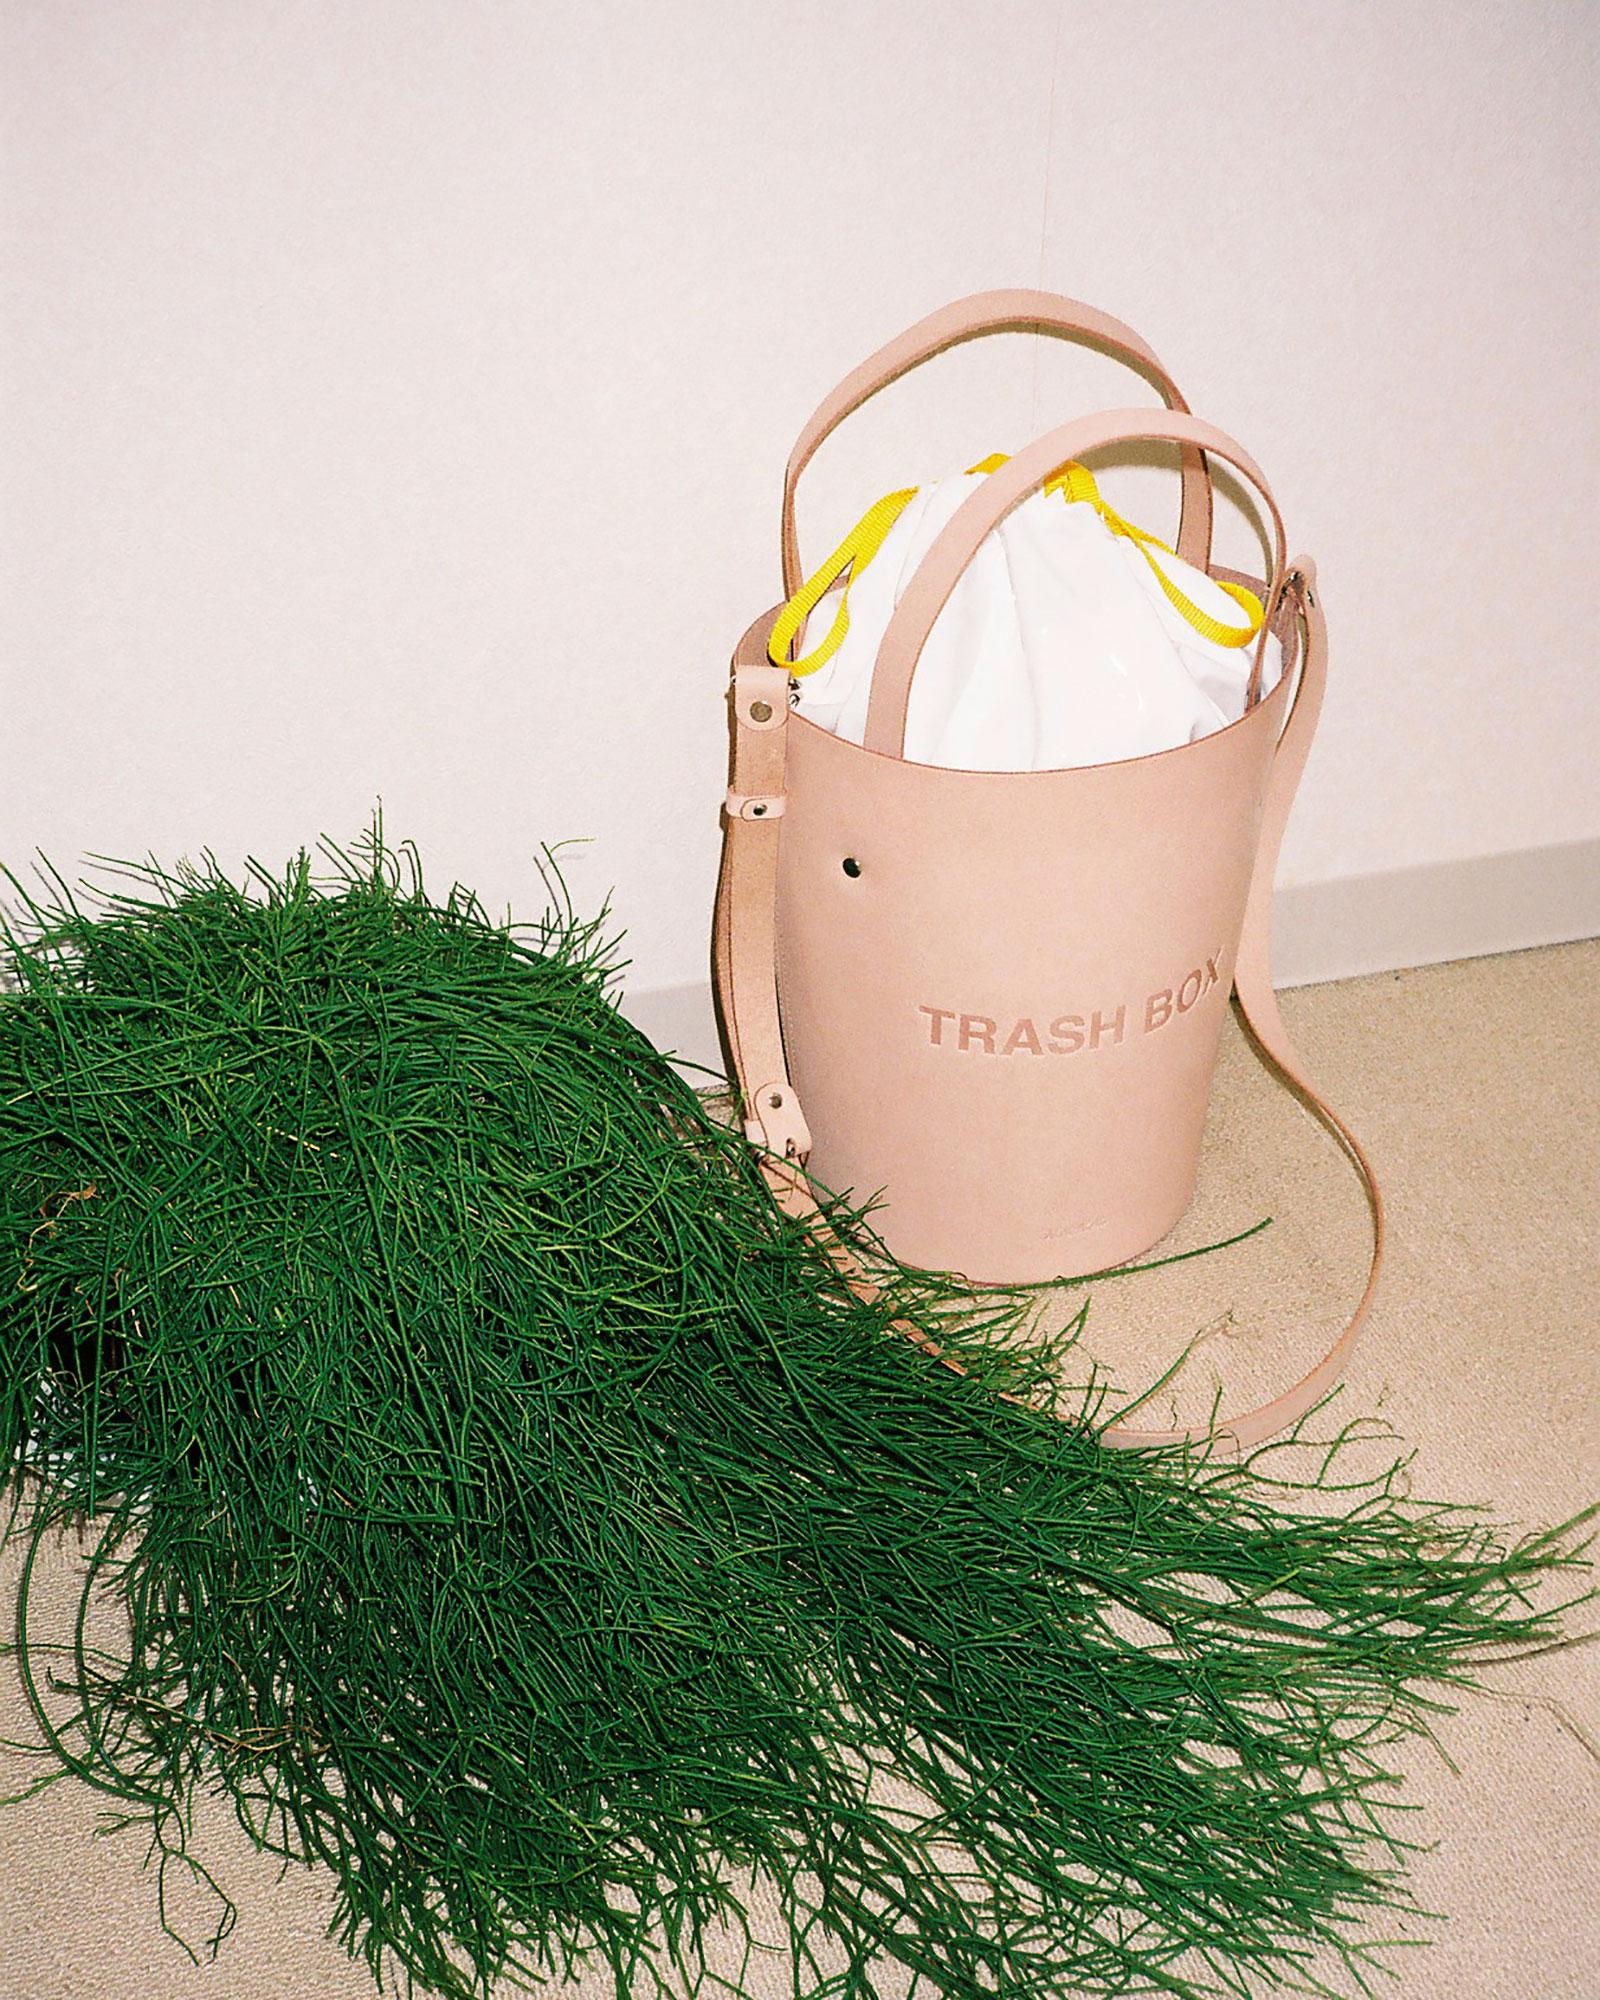 nana-nana leather trash bag